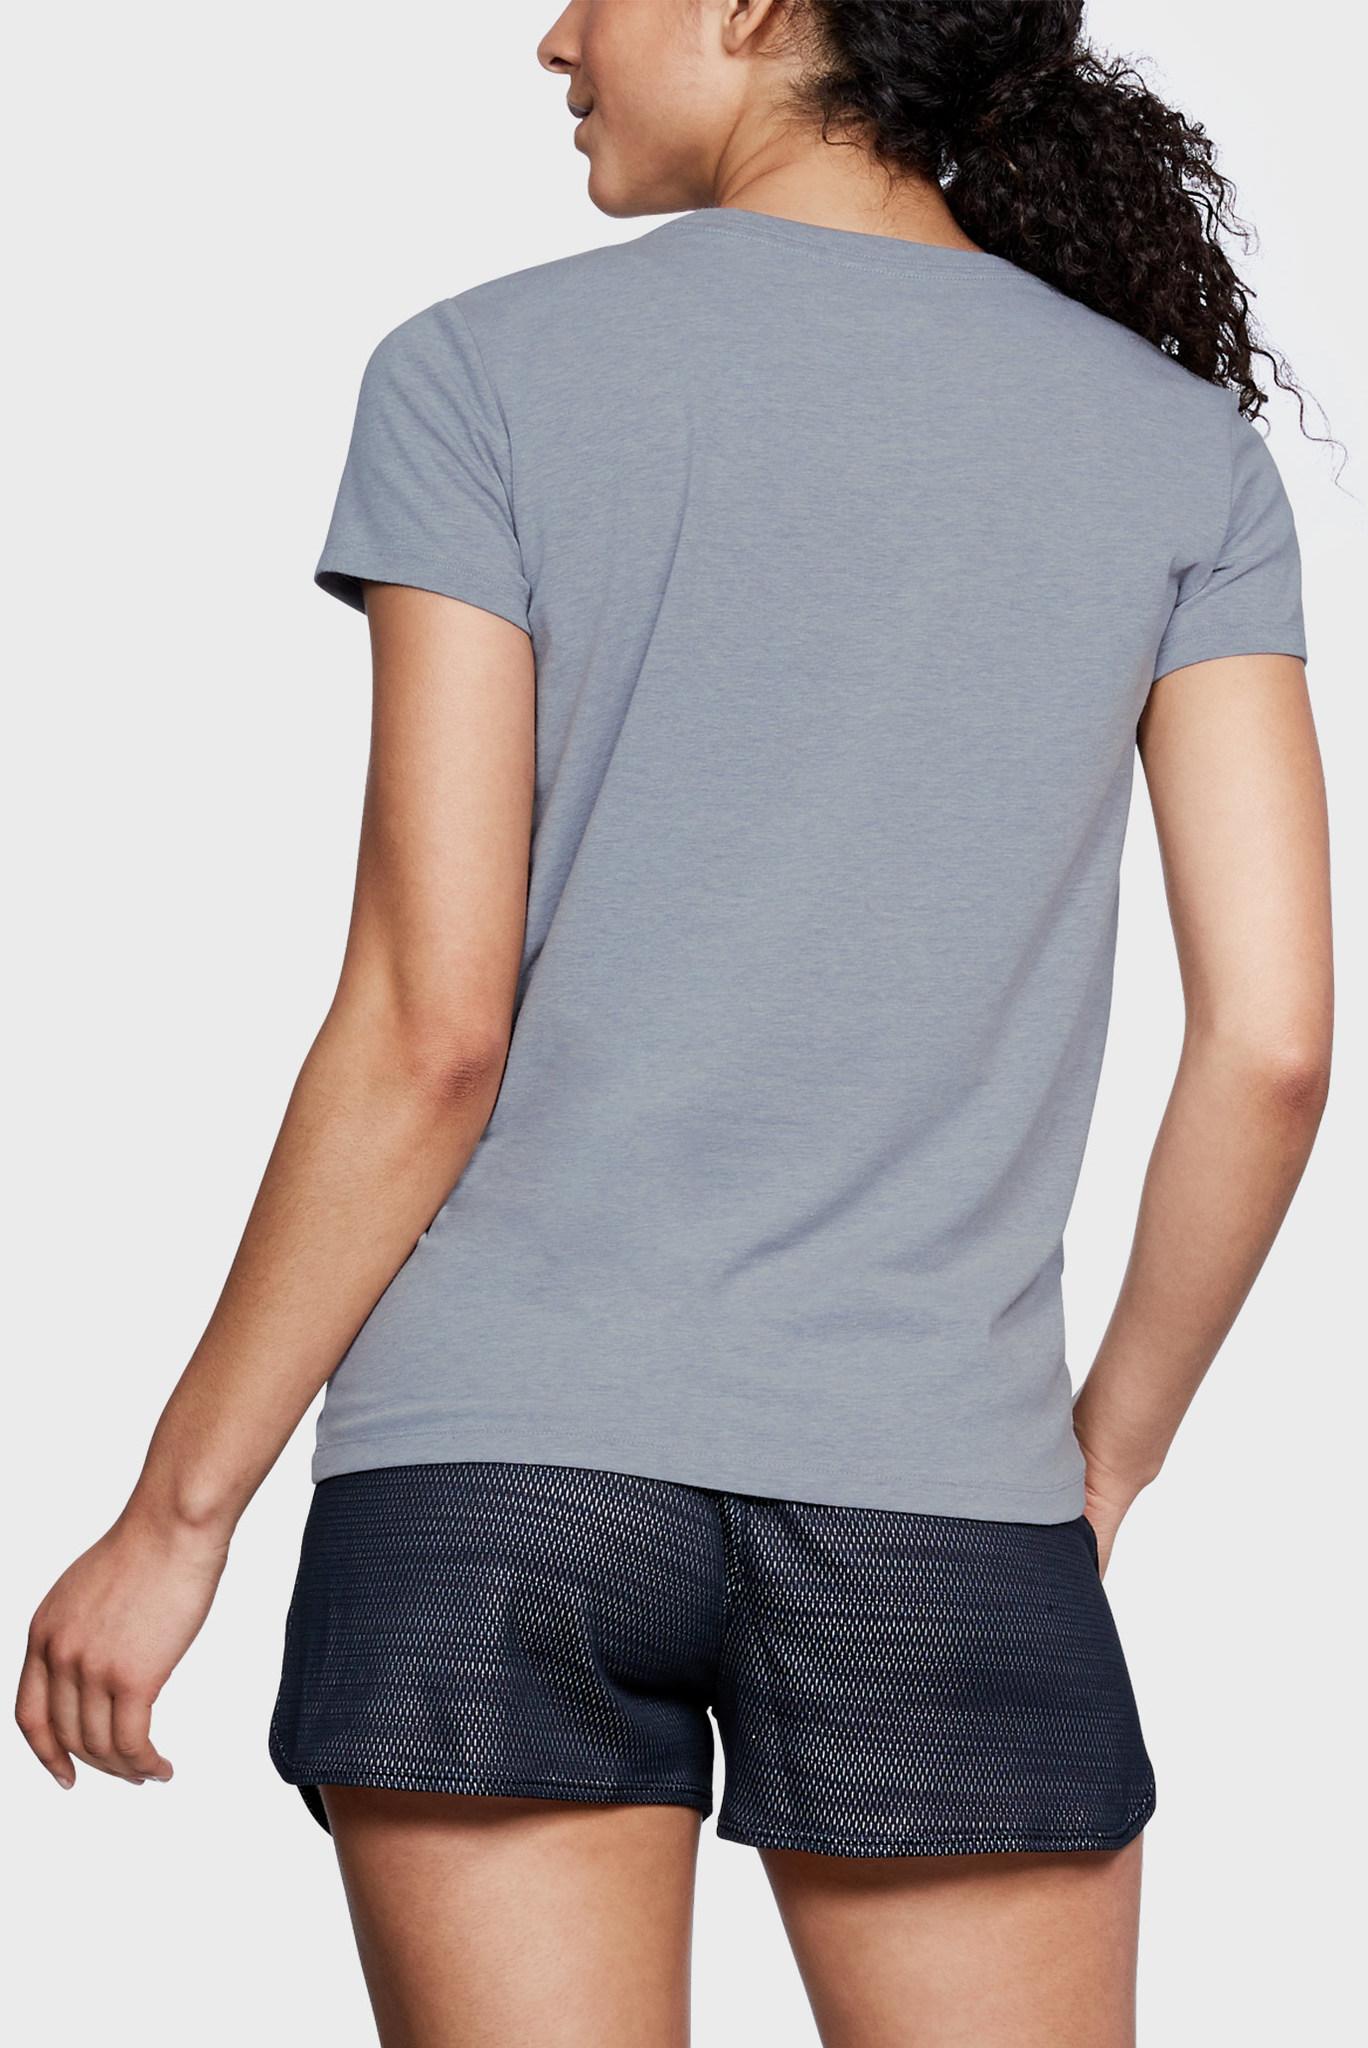 Женская серая футболка Sportstyle Branded Graphic Under Armour